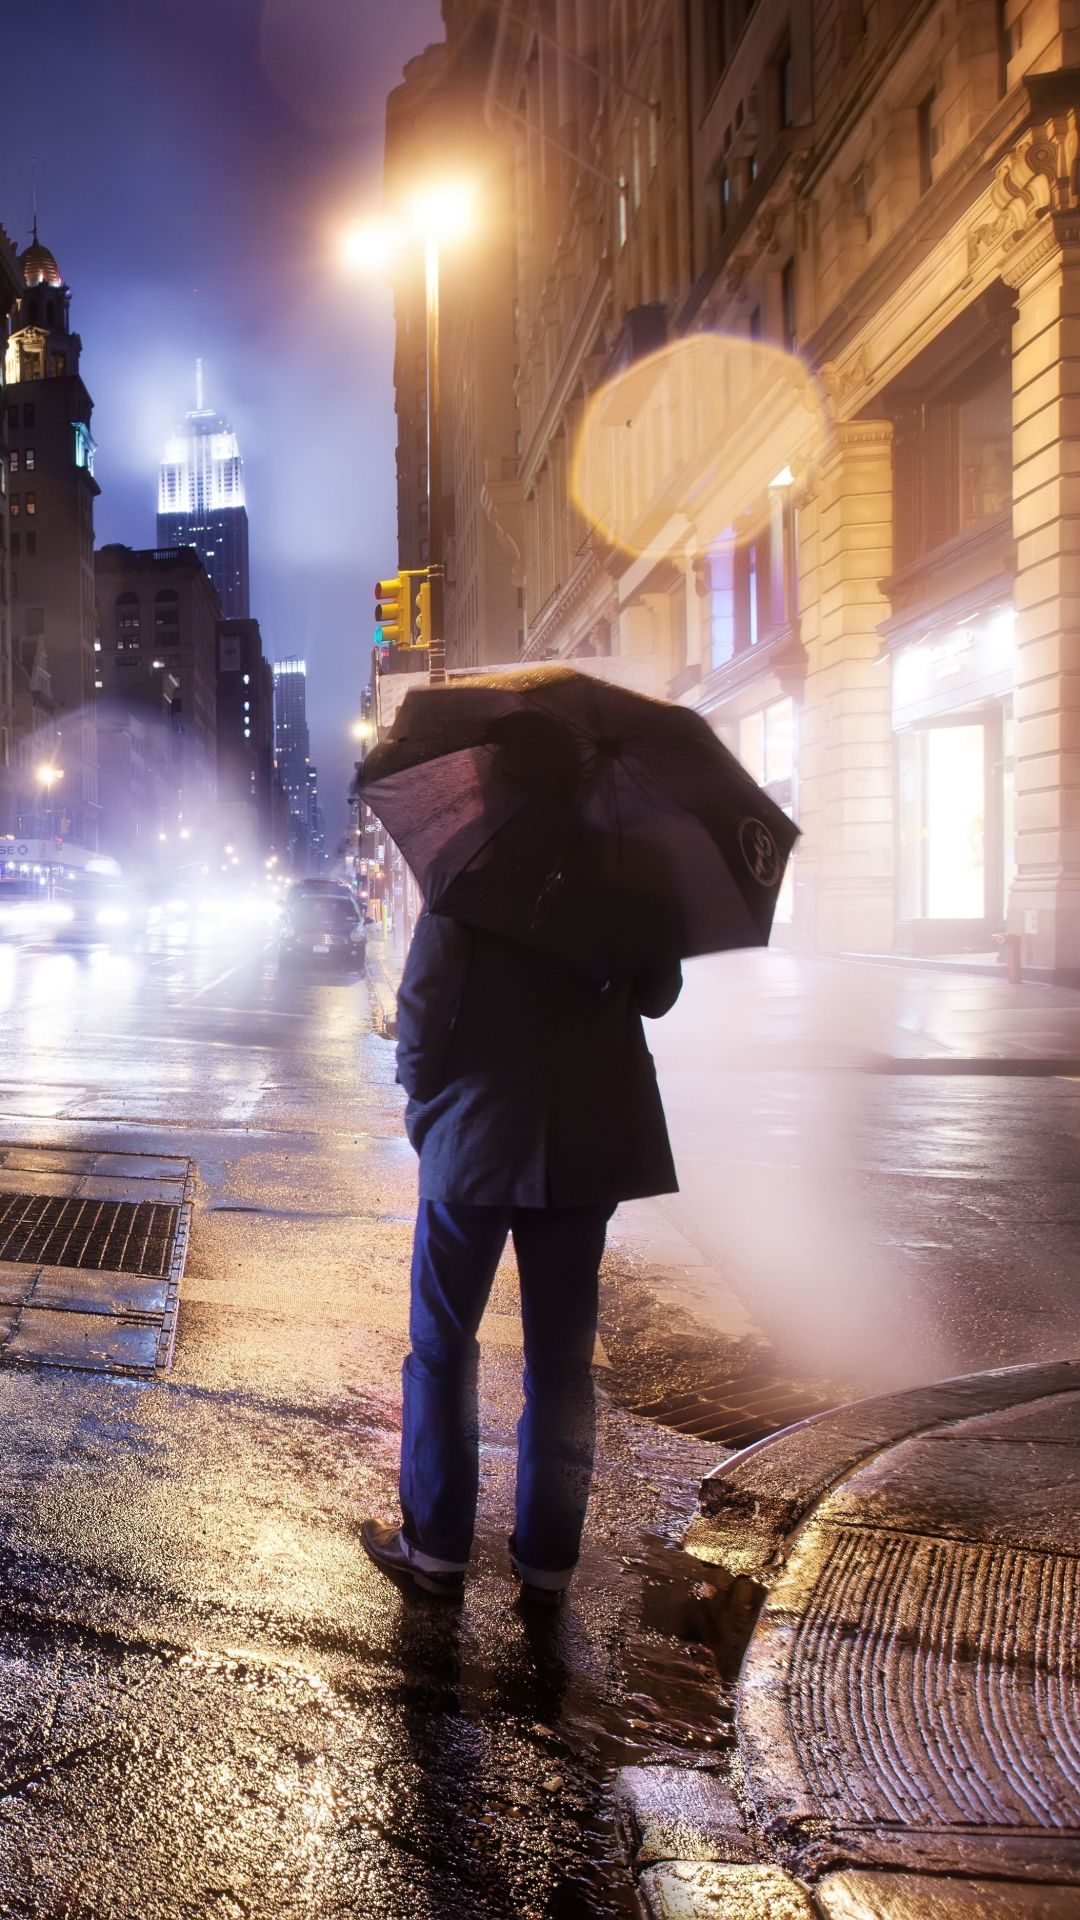 City Night Cloudy Lonely Man Umbrella Iphone 6 Wallpaper World Wallpaper Infinity Wallpaper City Wallpaper